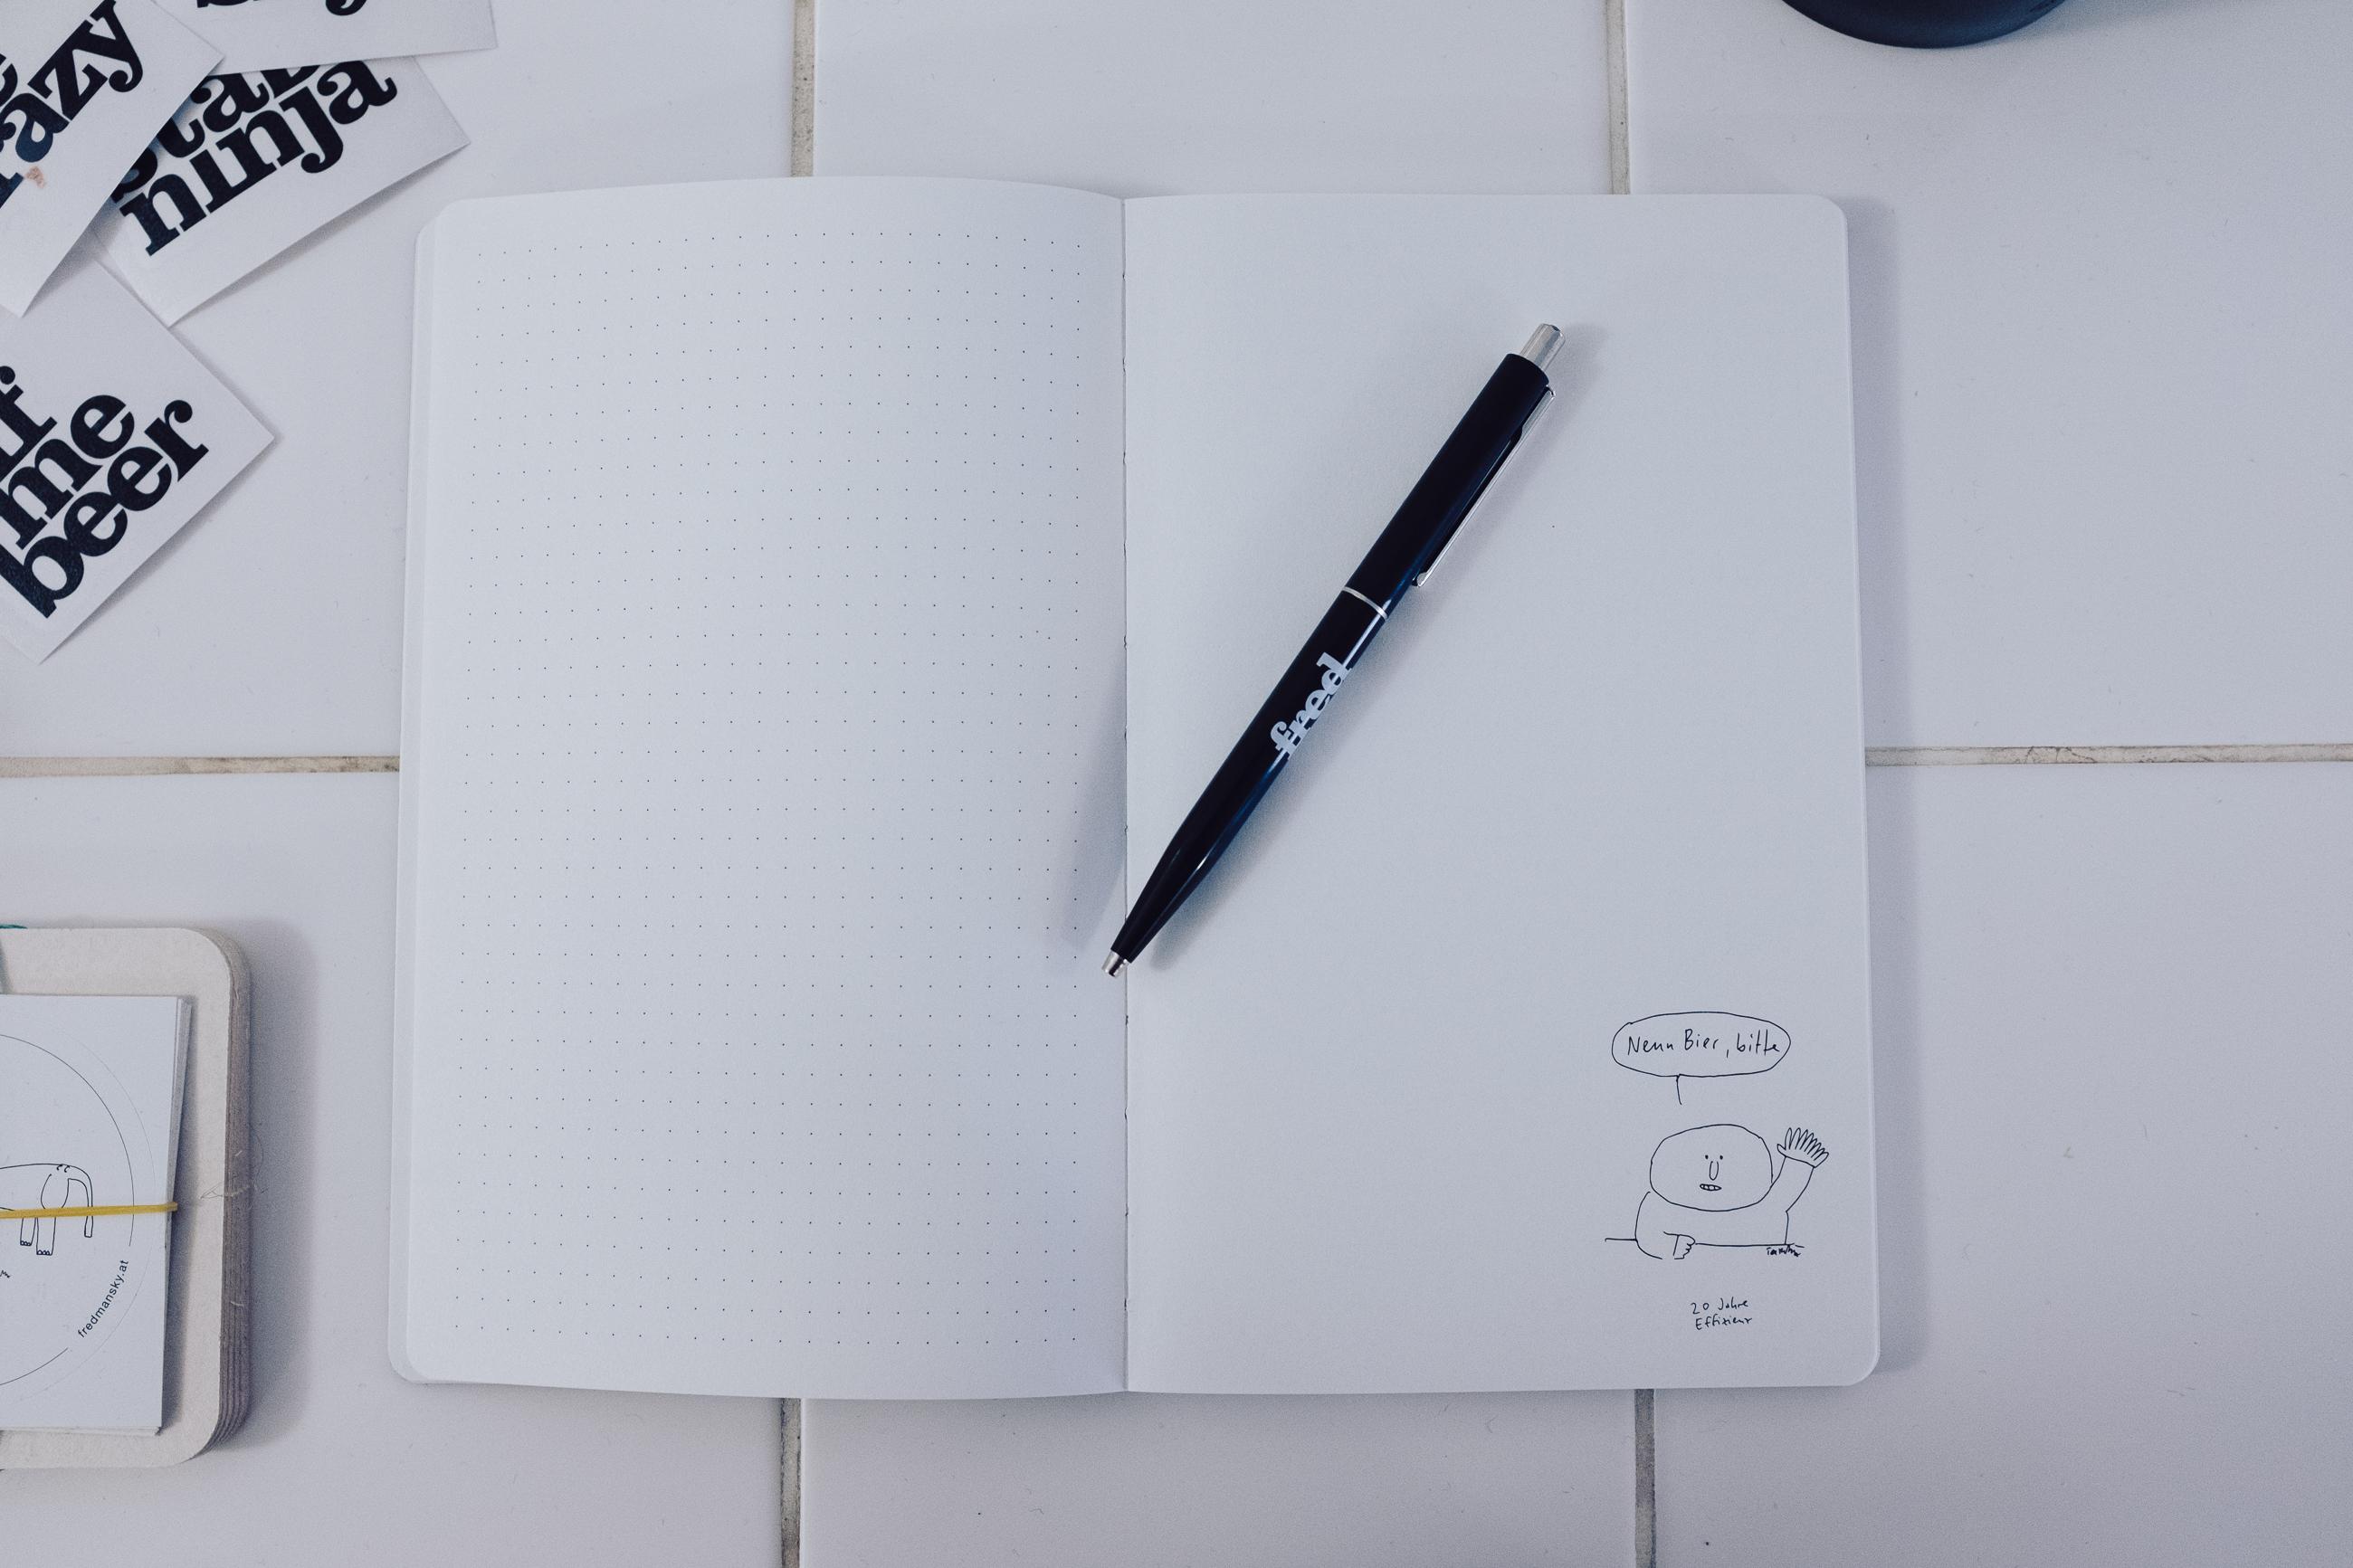 Fredmansky Brainbook00001